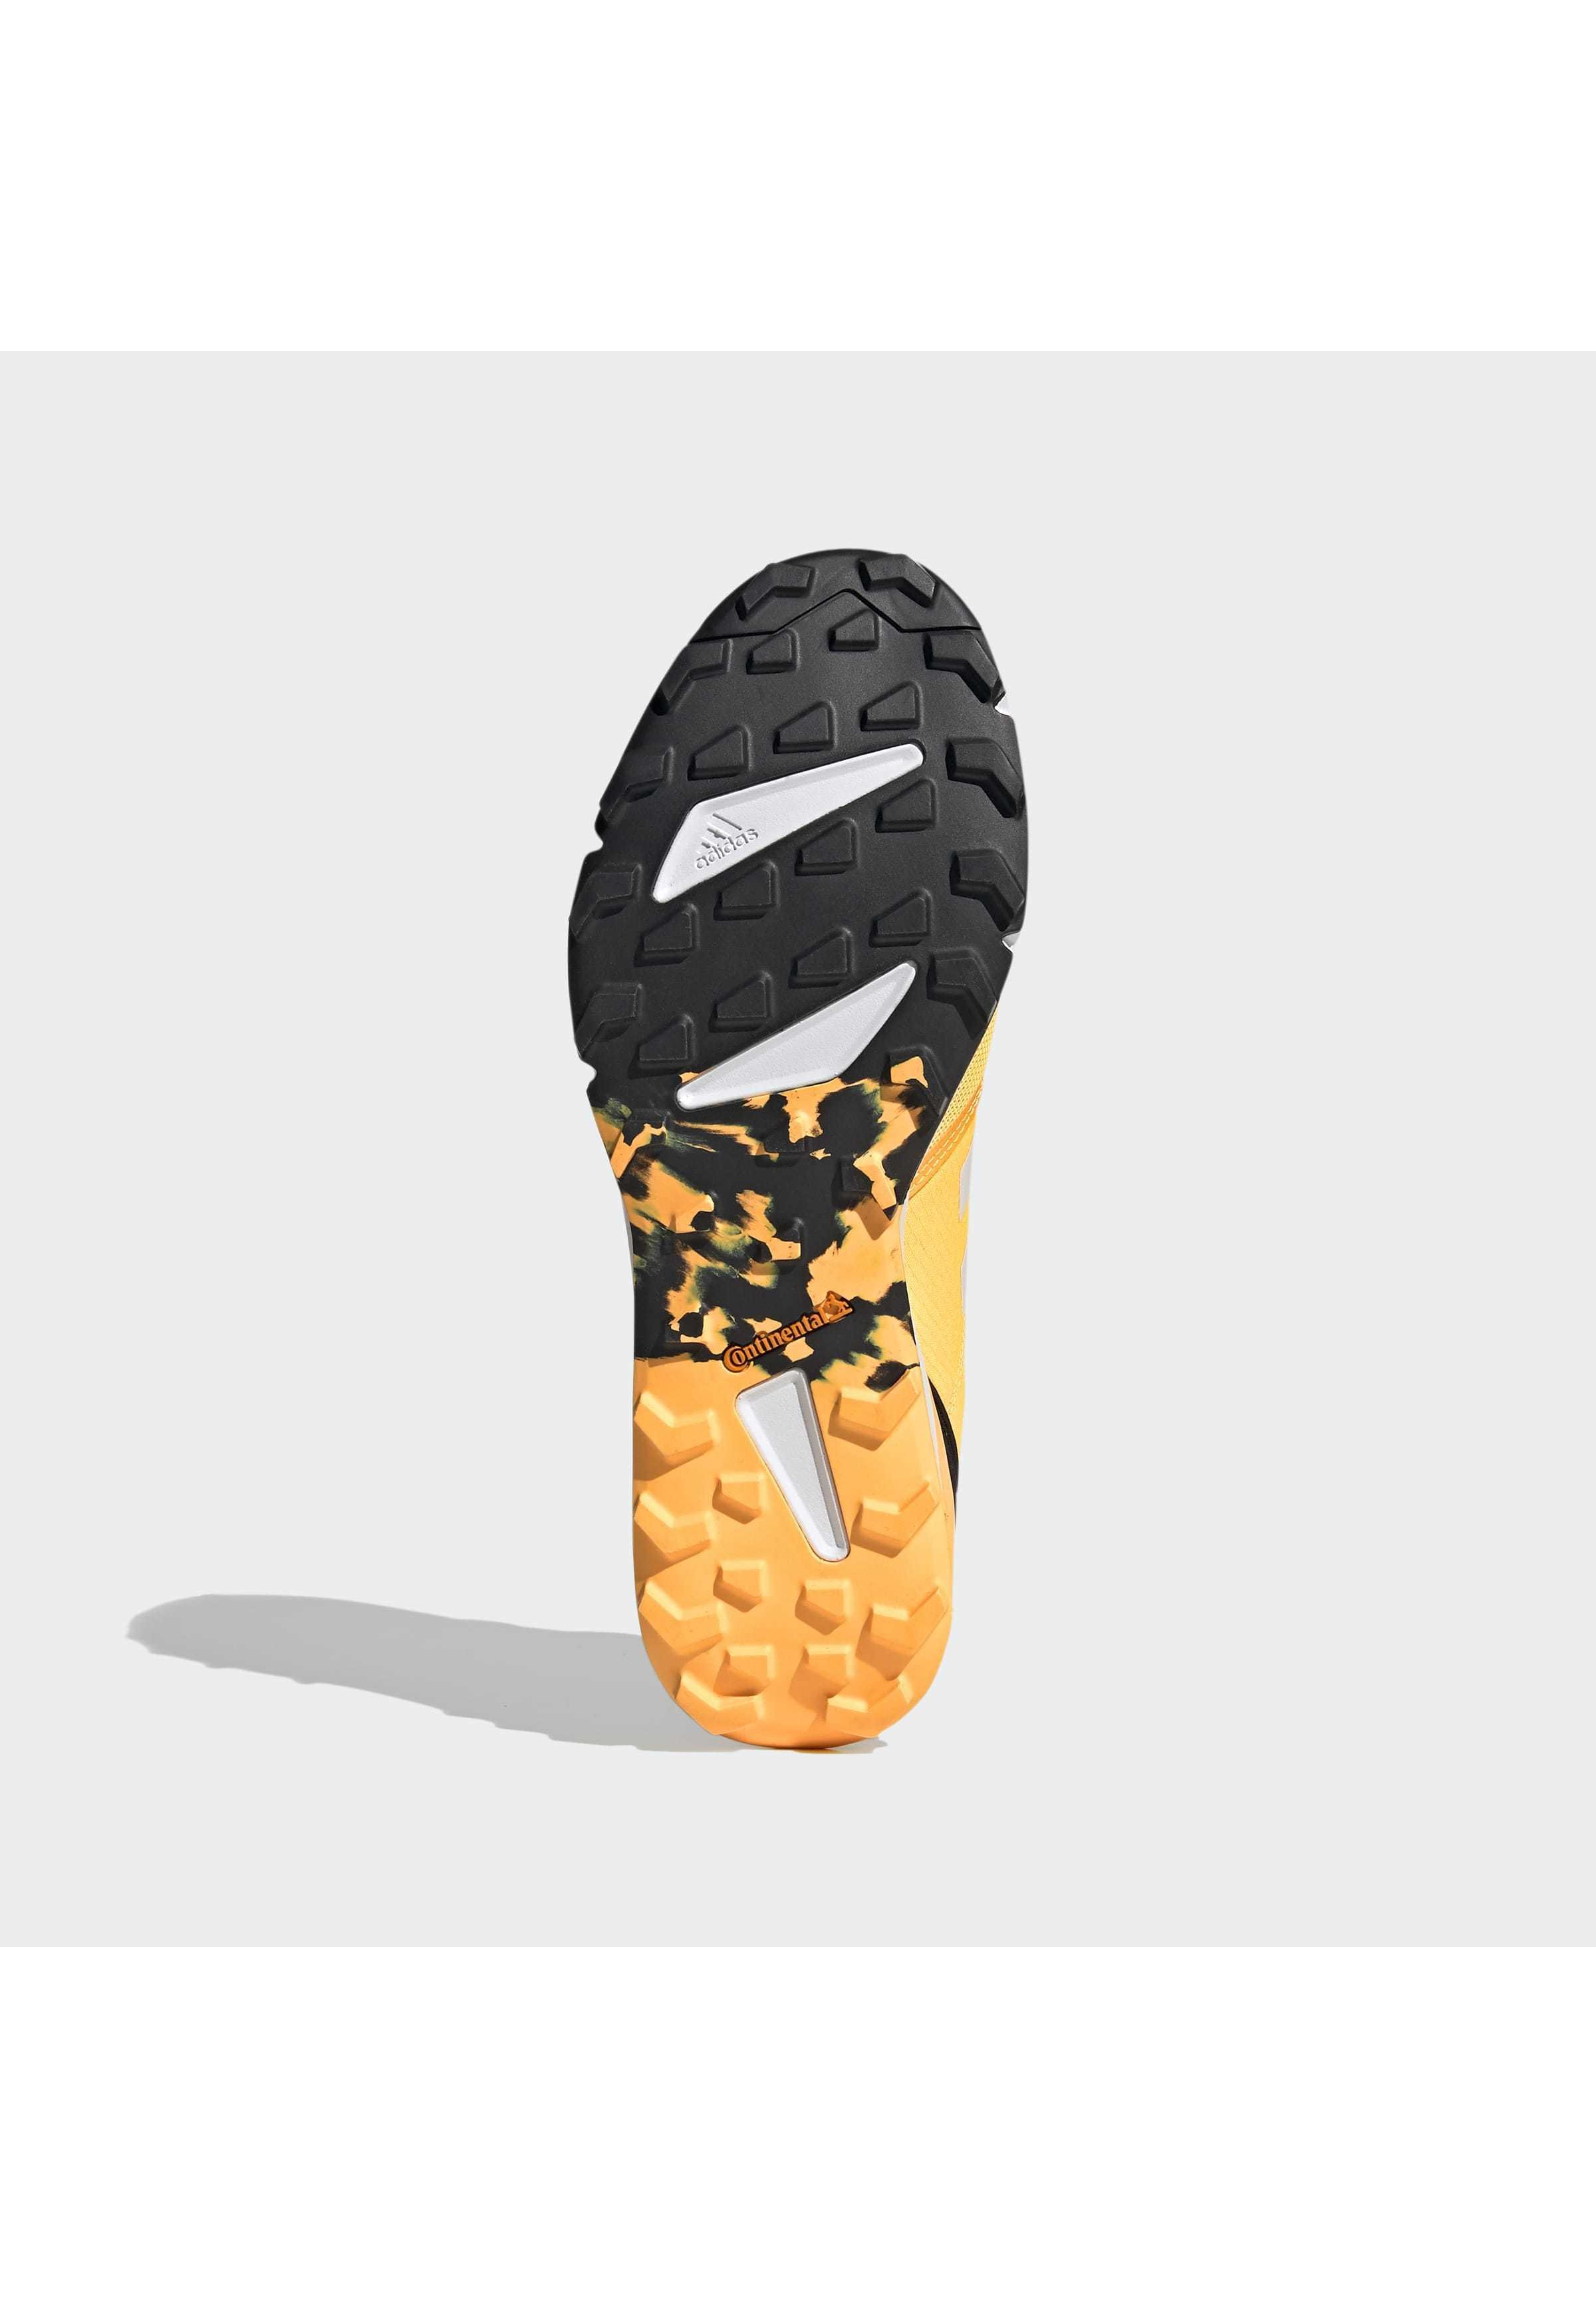 Nuovi prezzi più bassi Scarpe da uomo adidas Performance TERREX SPEED TRAIL RUNNING SHOES Scarpe da trail running gold